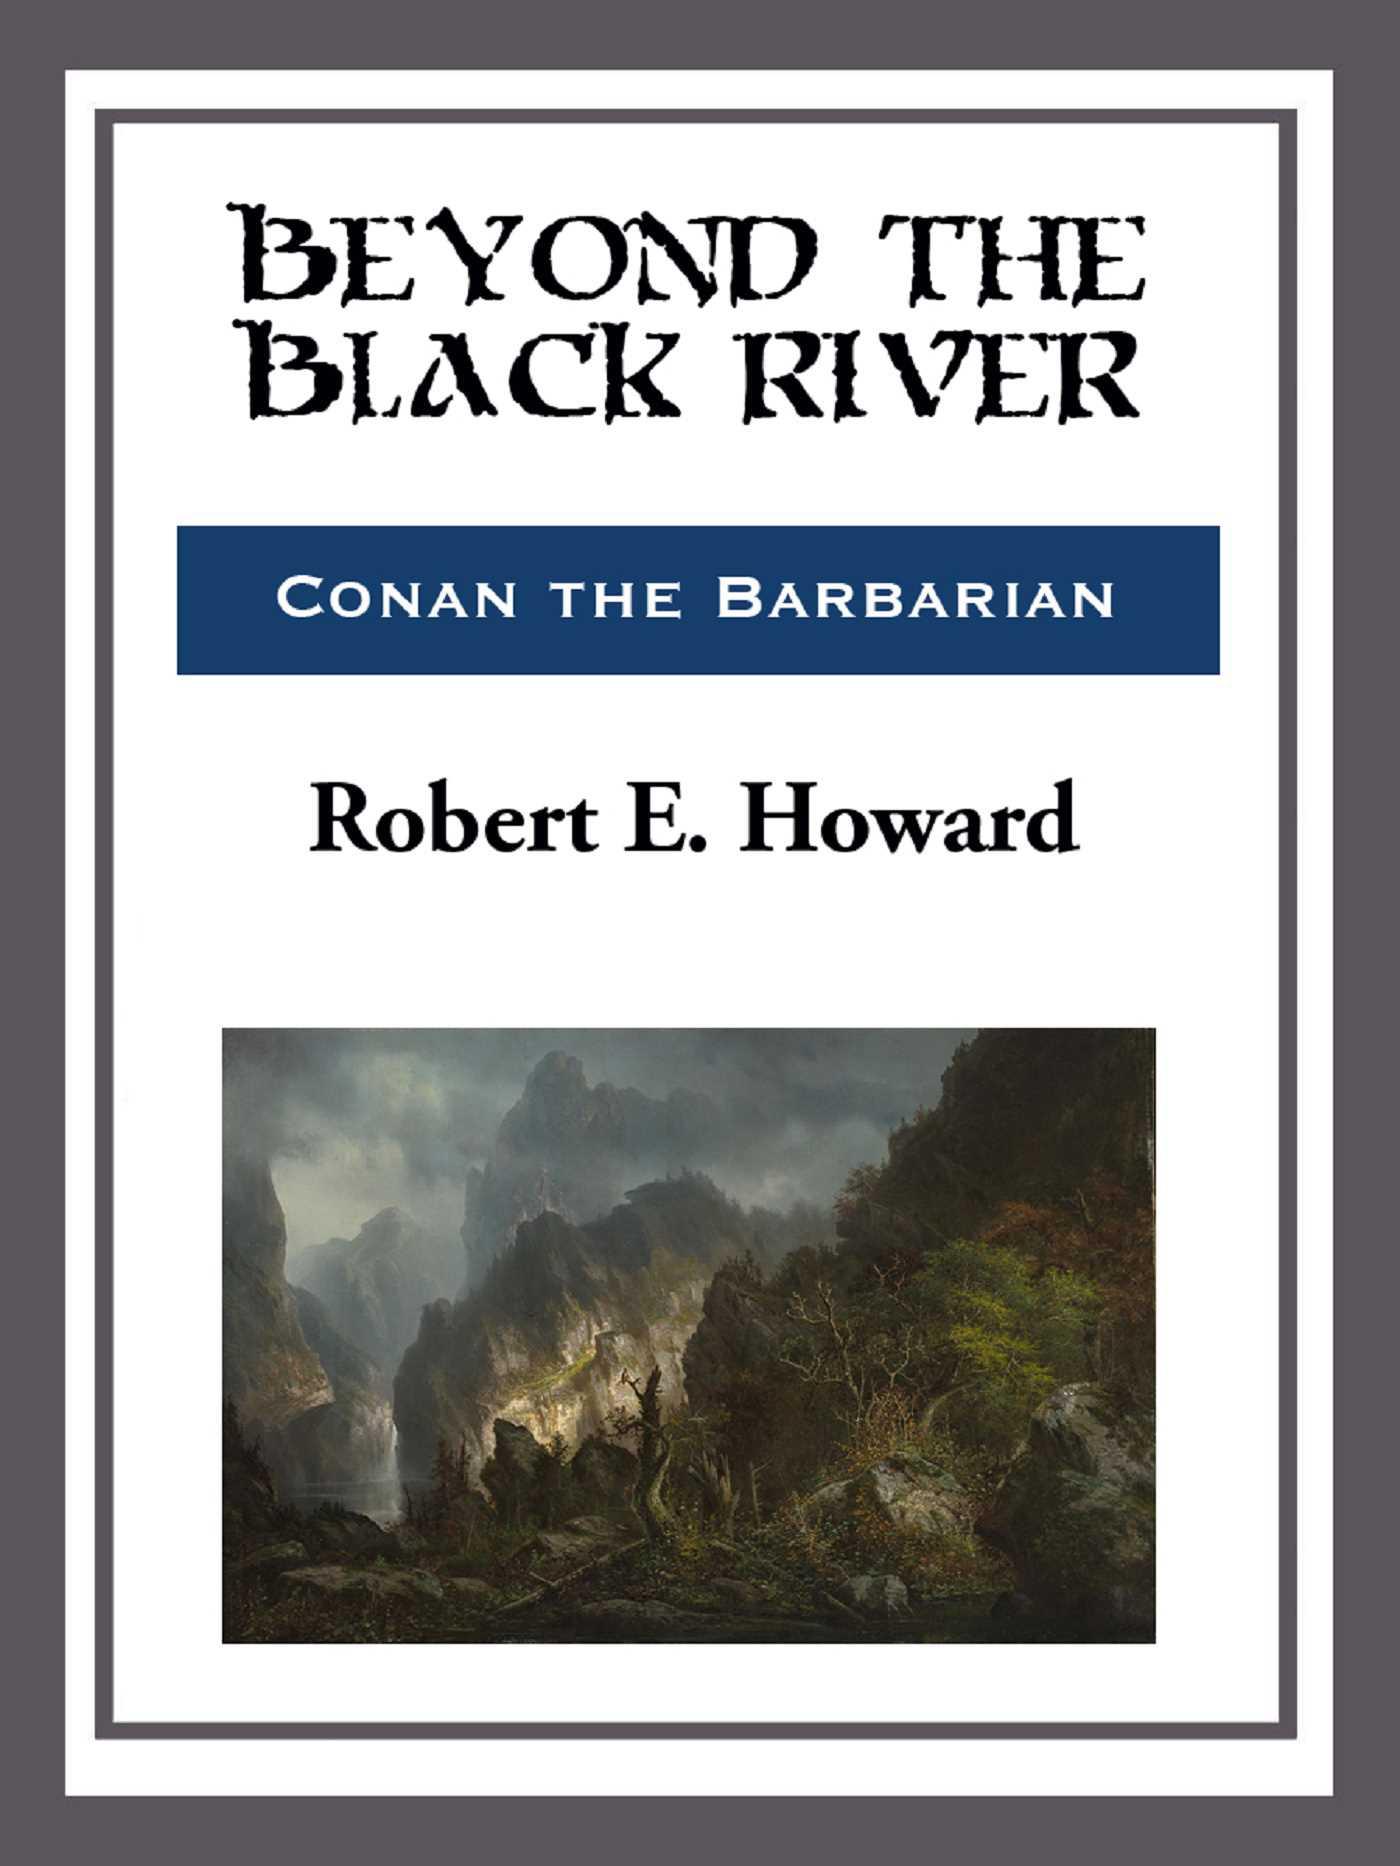 Beyond the black river 9781681463780 hr